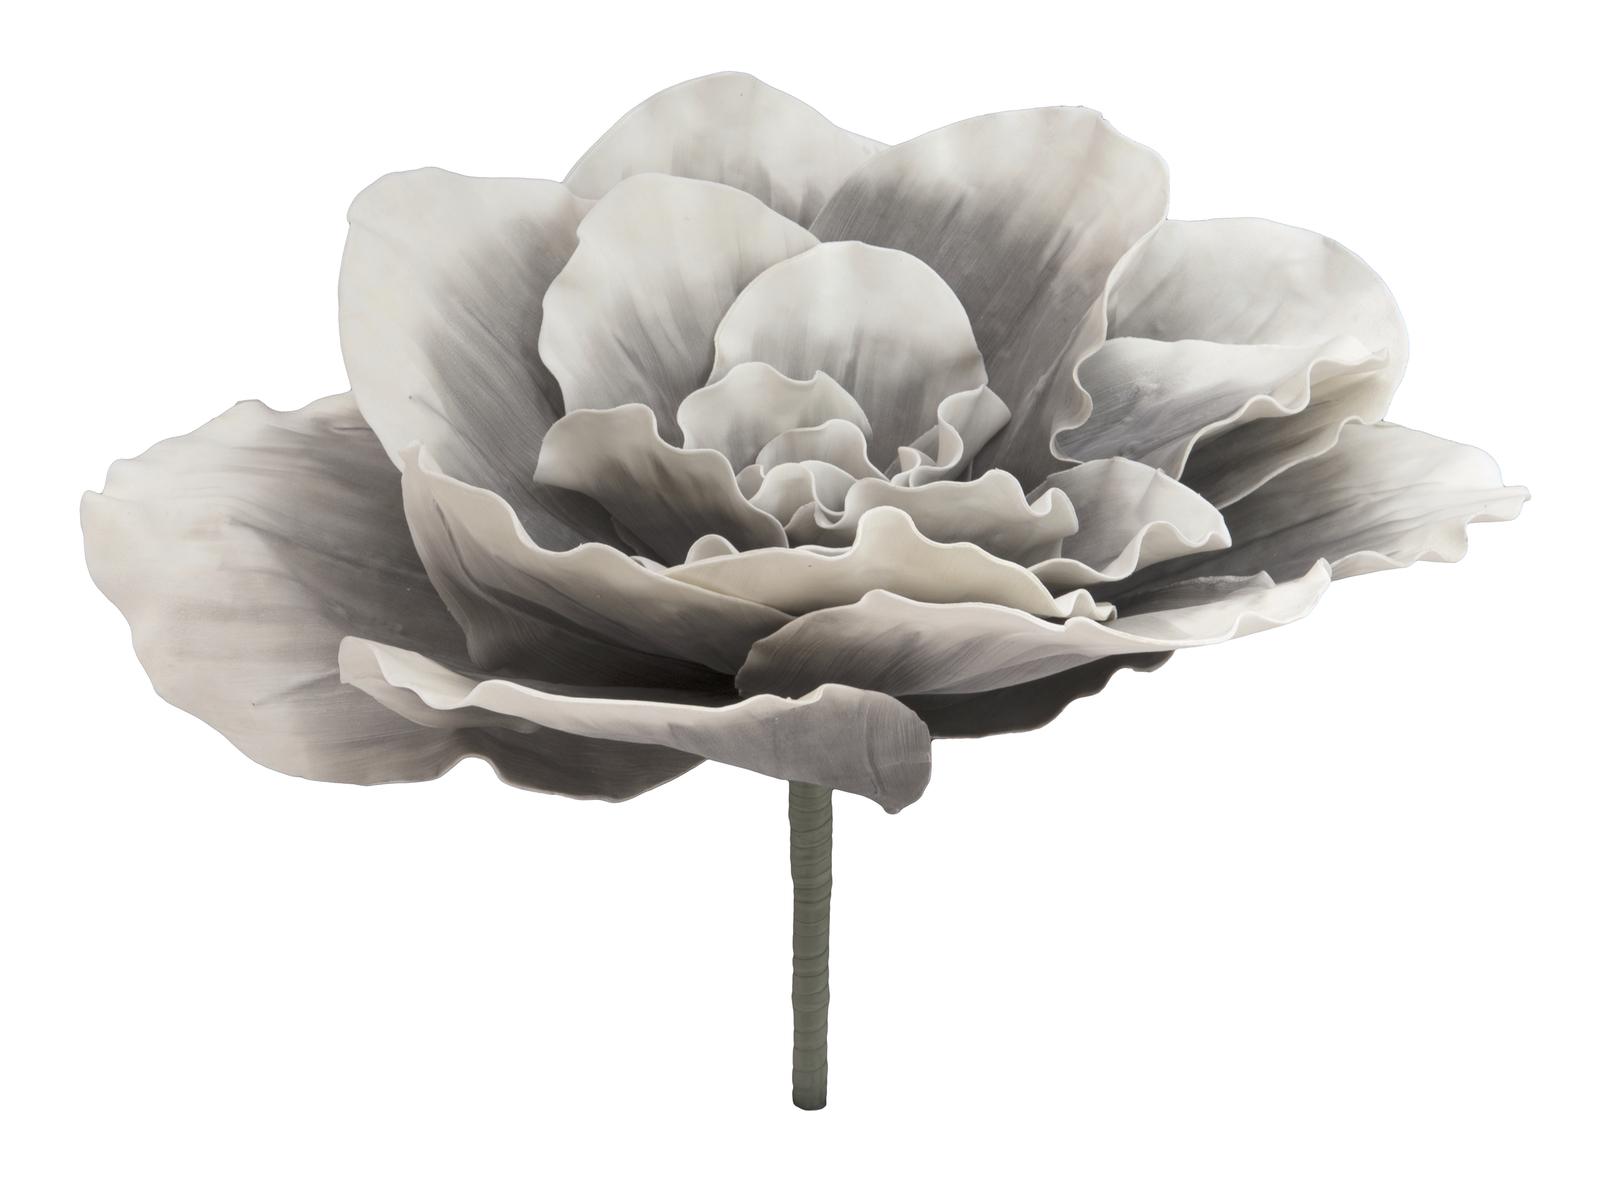 EUROPALMS pianta artificiale FIORE GIGANTE (EVA), grigio pietra, 80cm